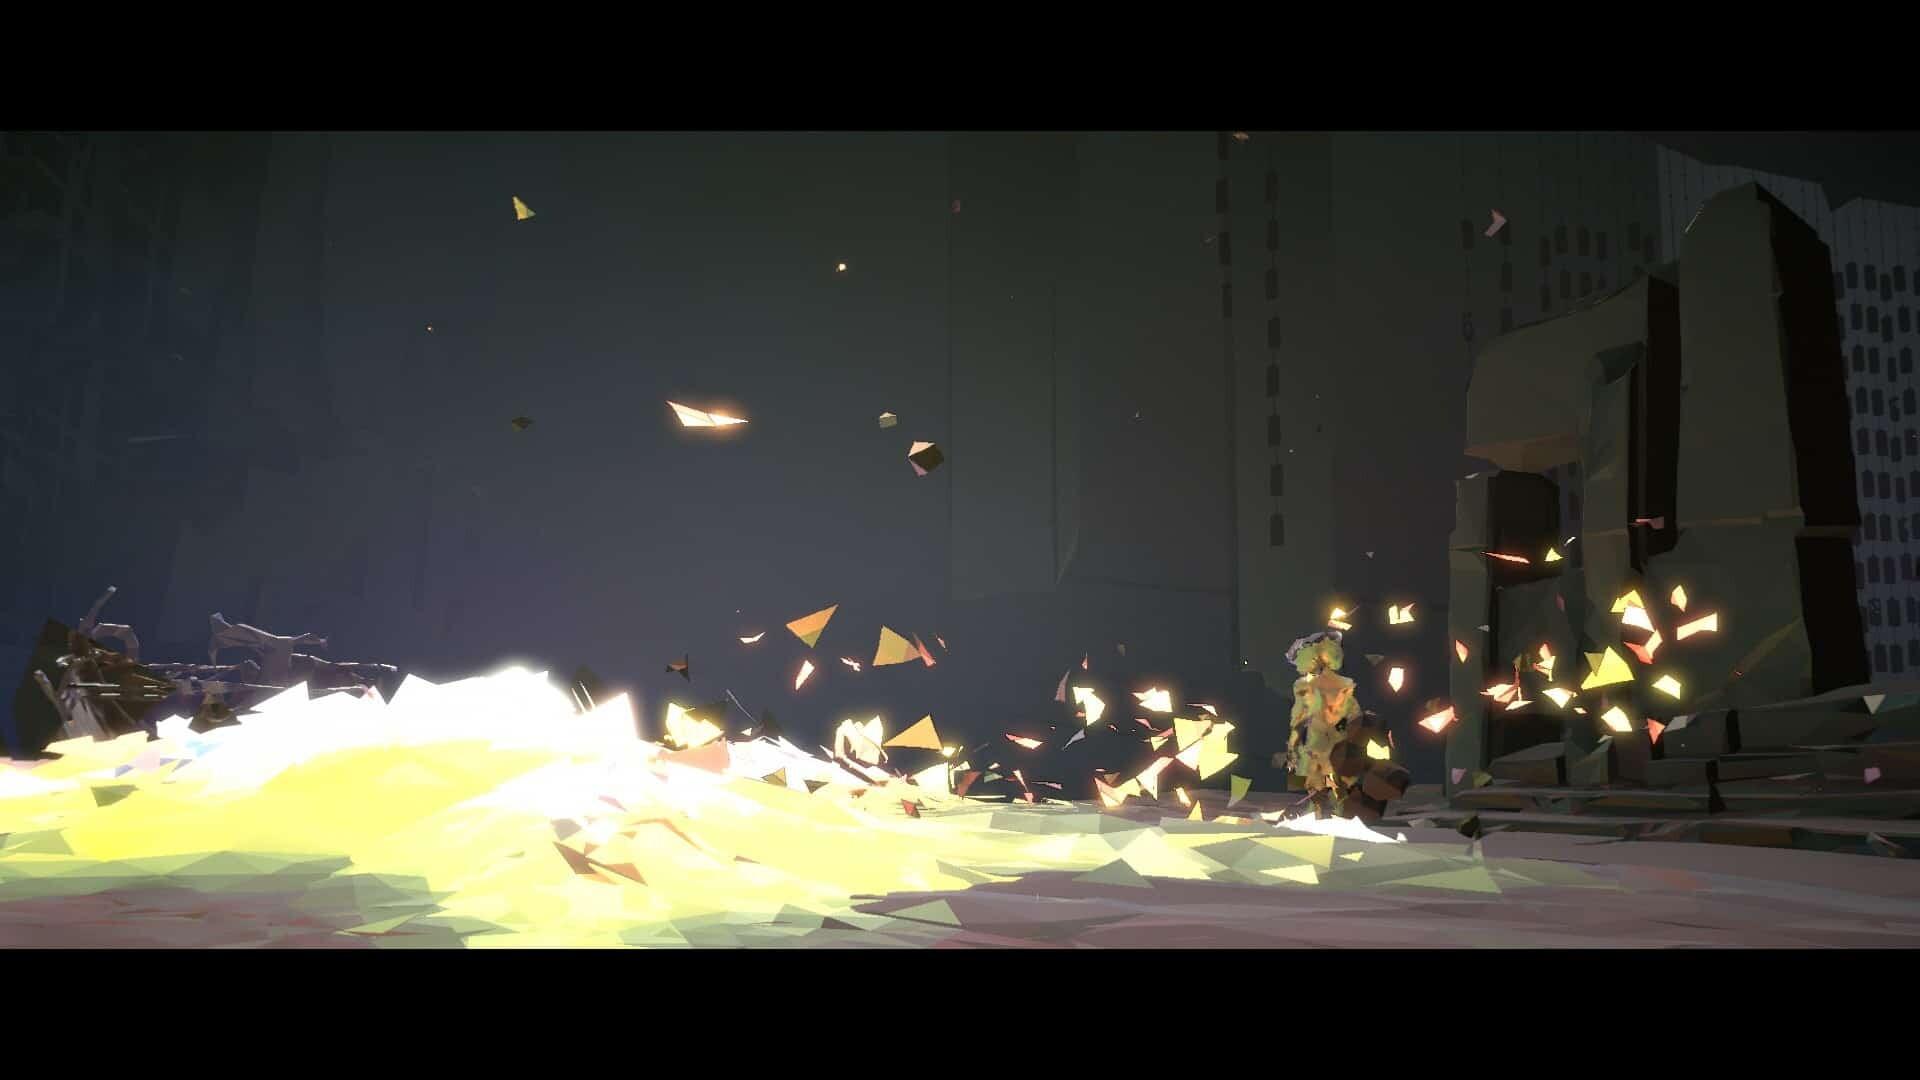 Vane game screenshot, gold dust